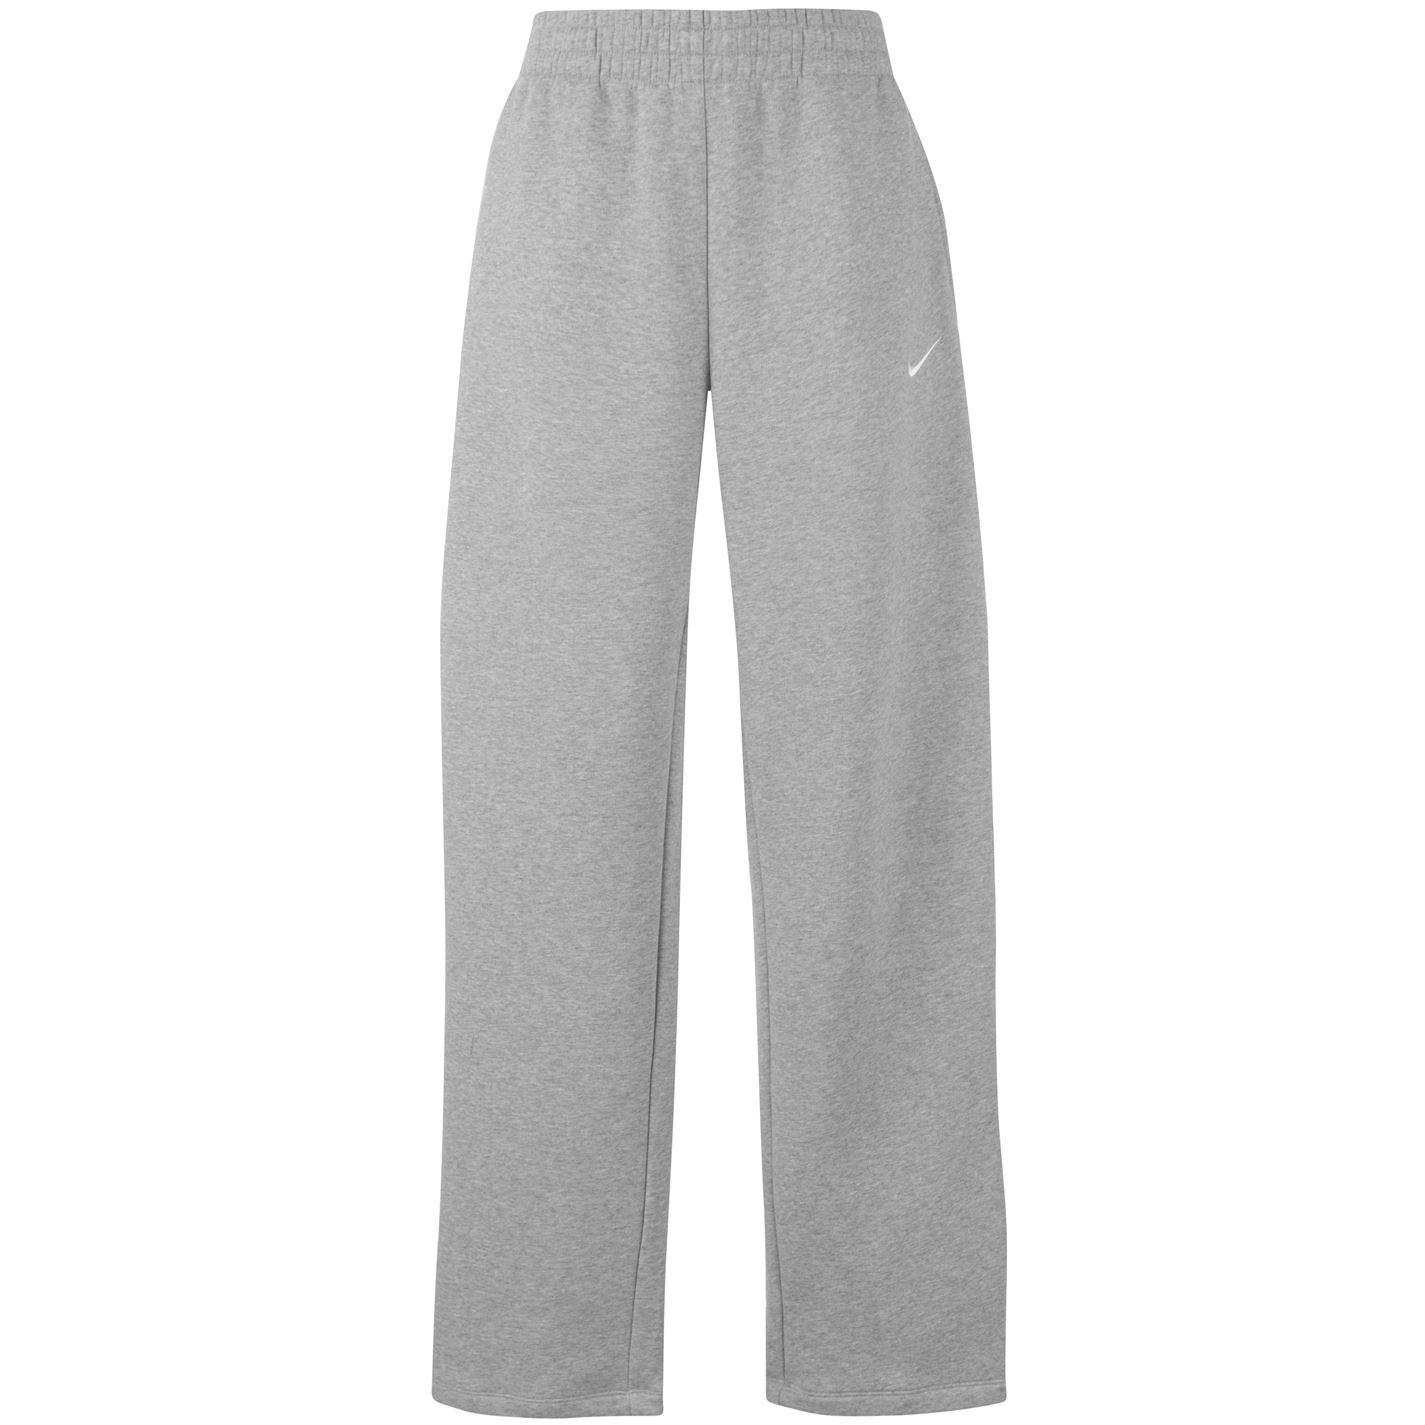 e606f4539c71 ... Nike Open Hem Jogging Tracksuit Bottoms Sweatpants Mens Grey Track  Pants Joggers ...